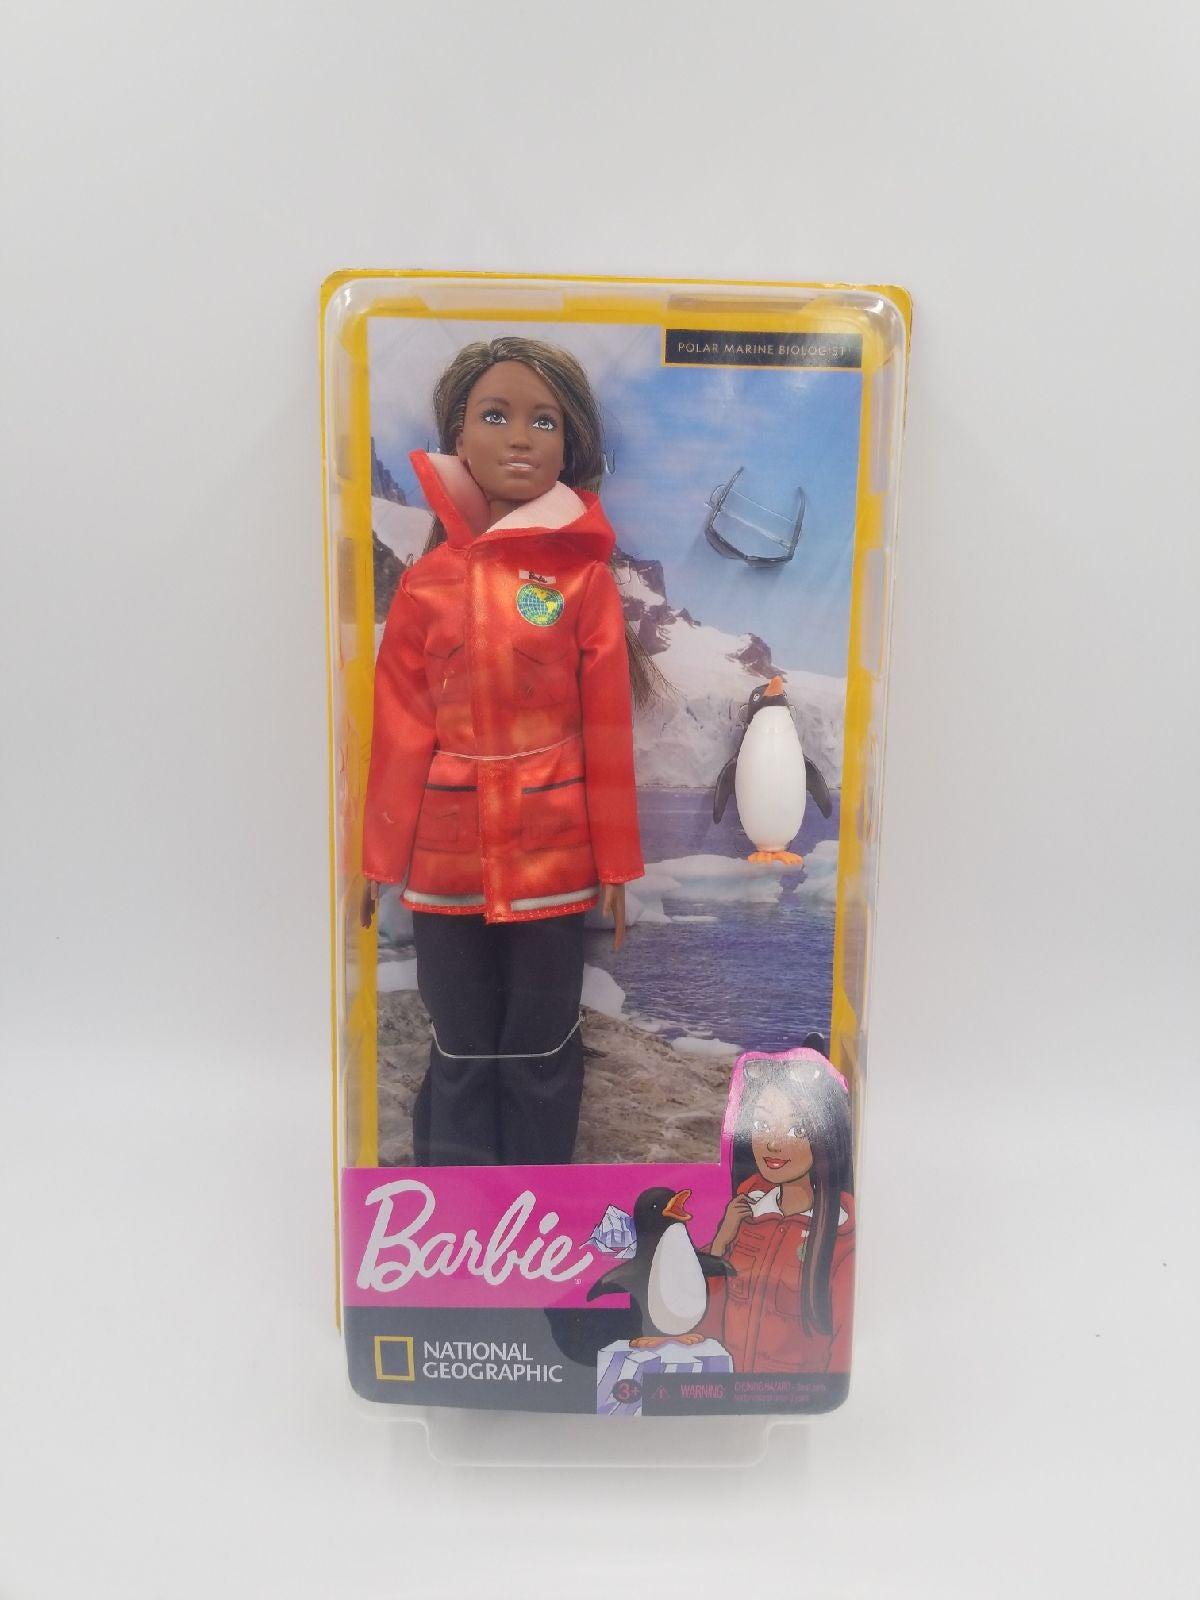 Barbie Polar Marine Biologist